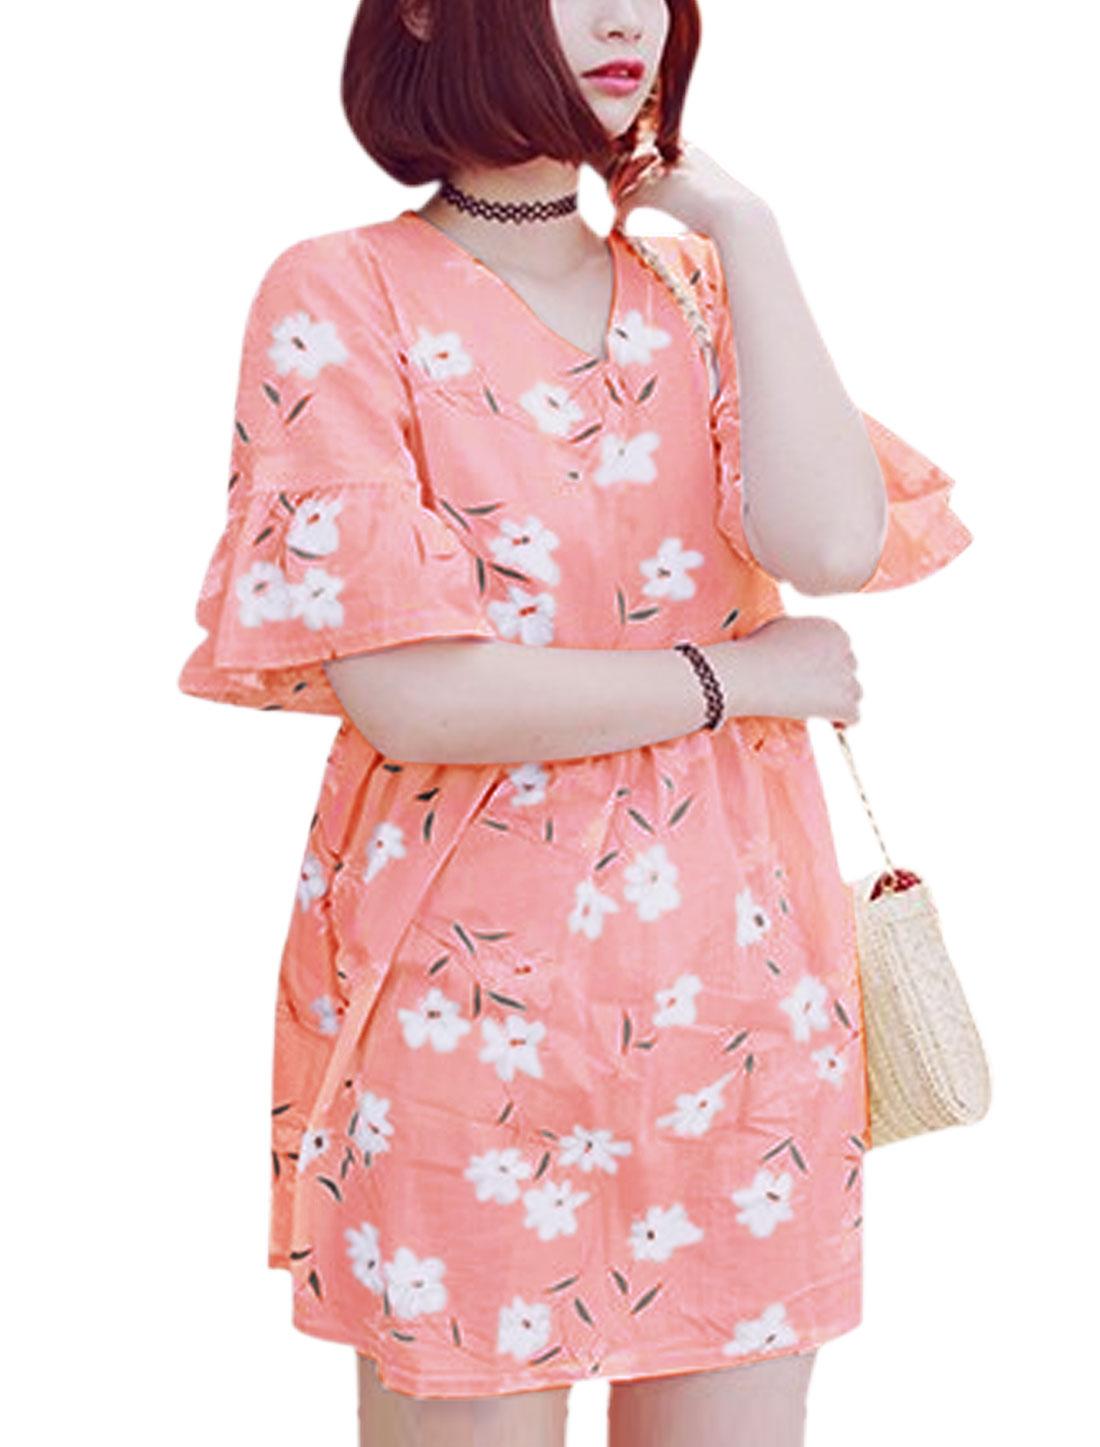 Ladies Bell Sleeves Floral Print V Neckline Babydoll Dress Pink XS